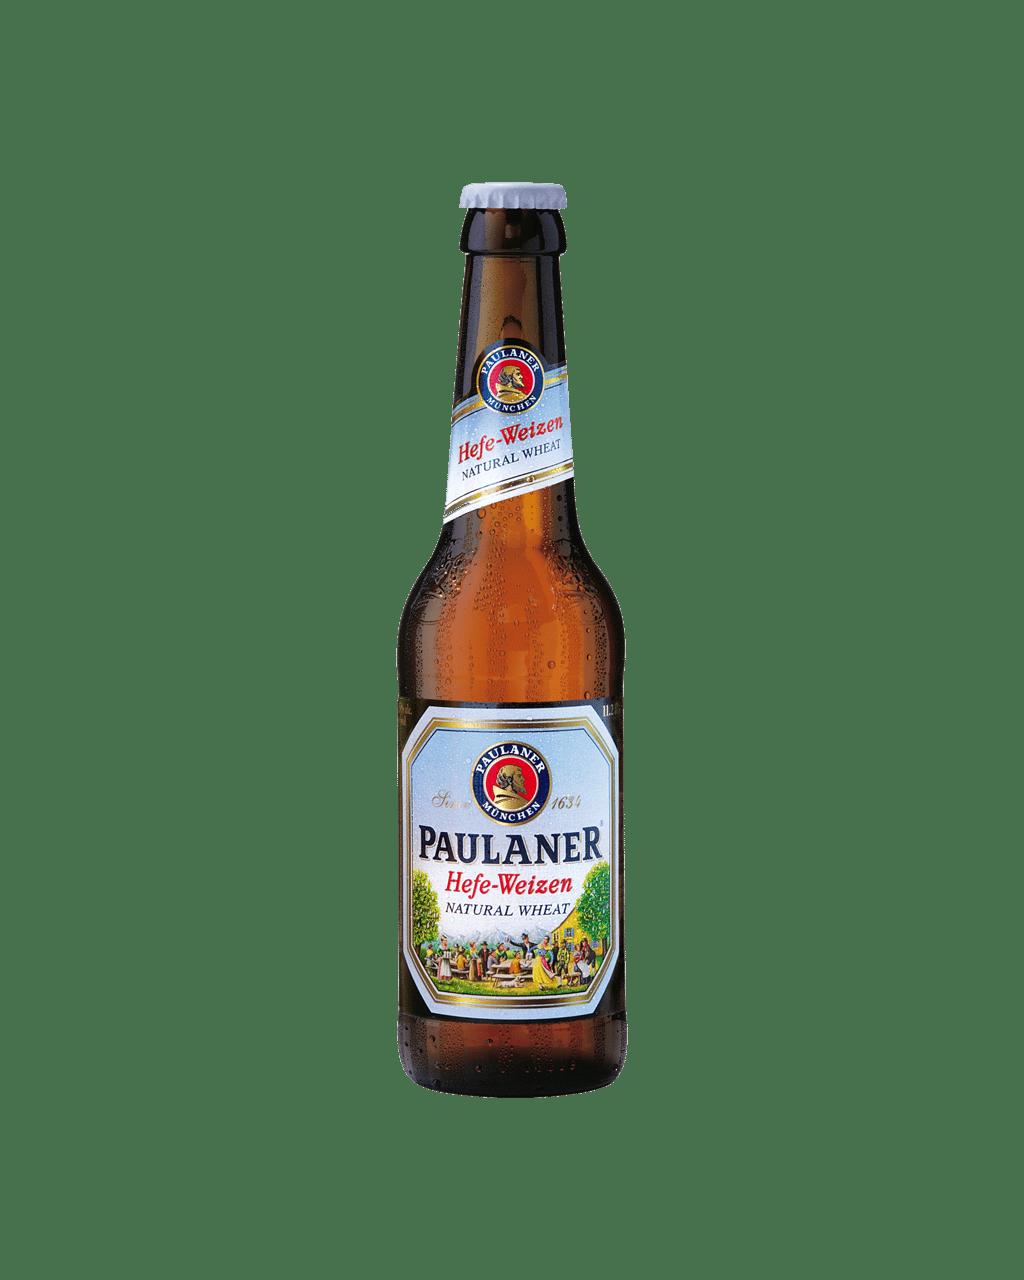 Beer Paulaner (Paulaner) - real German quality 63